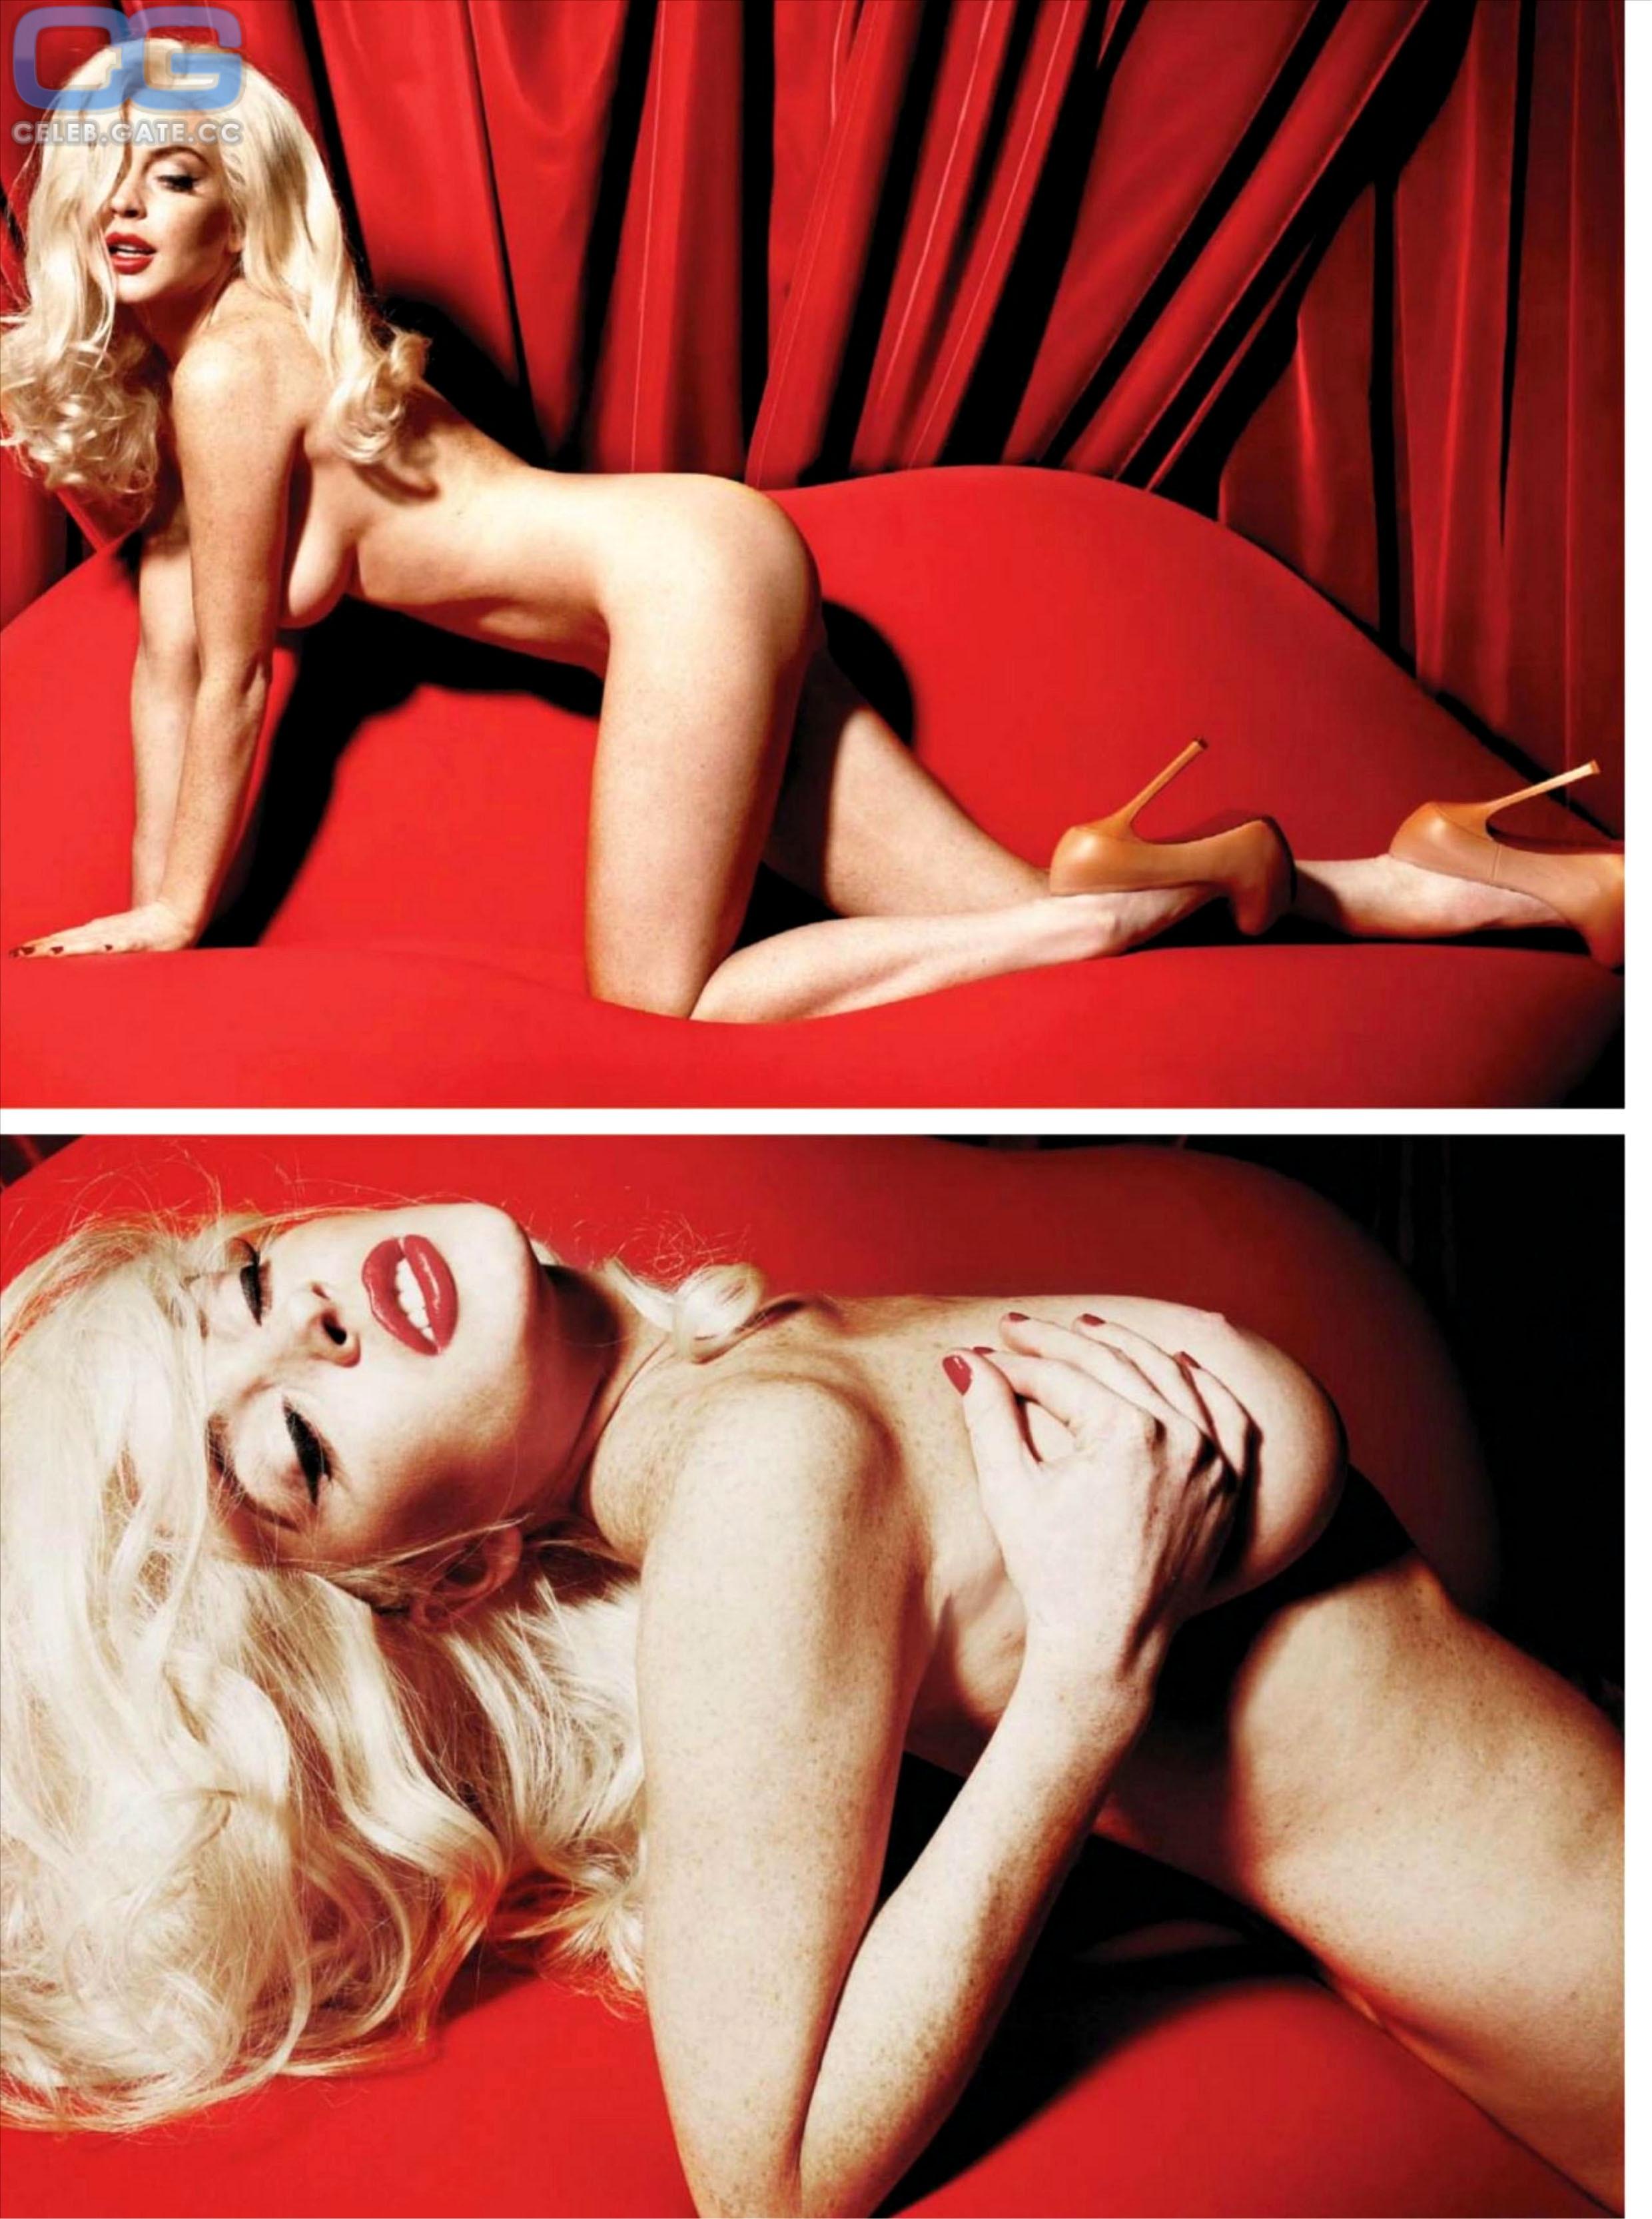 Nacktbilder lindsay lohan Melissa Rauch